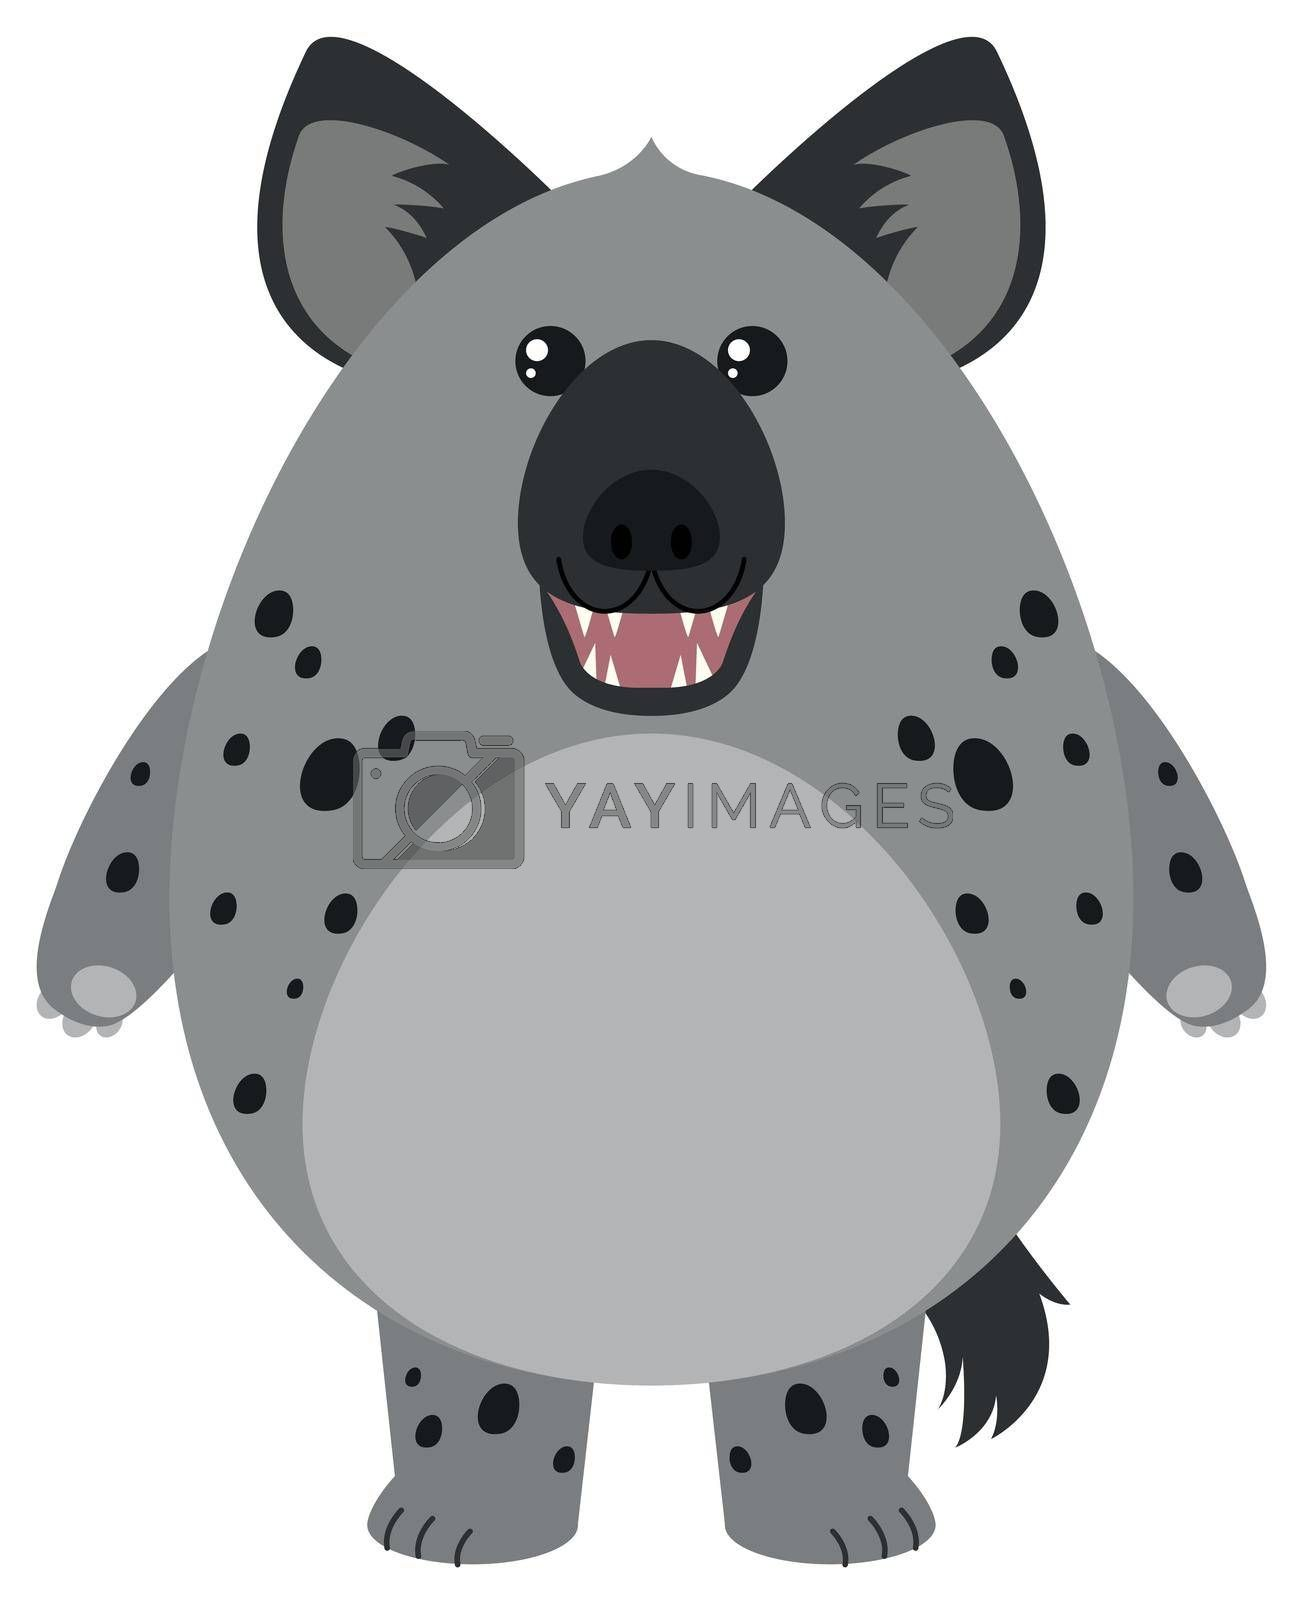 Hyena with round body illustration